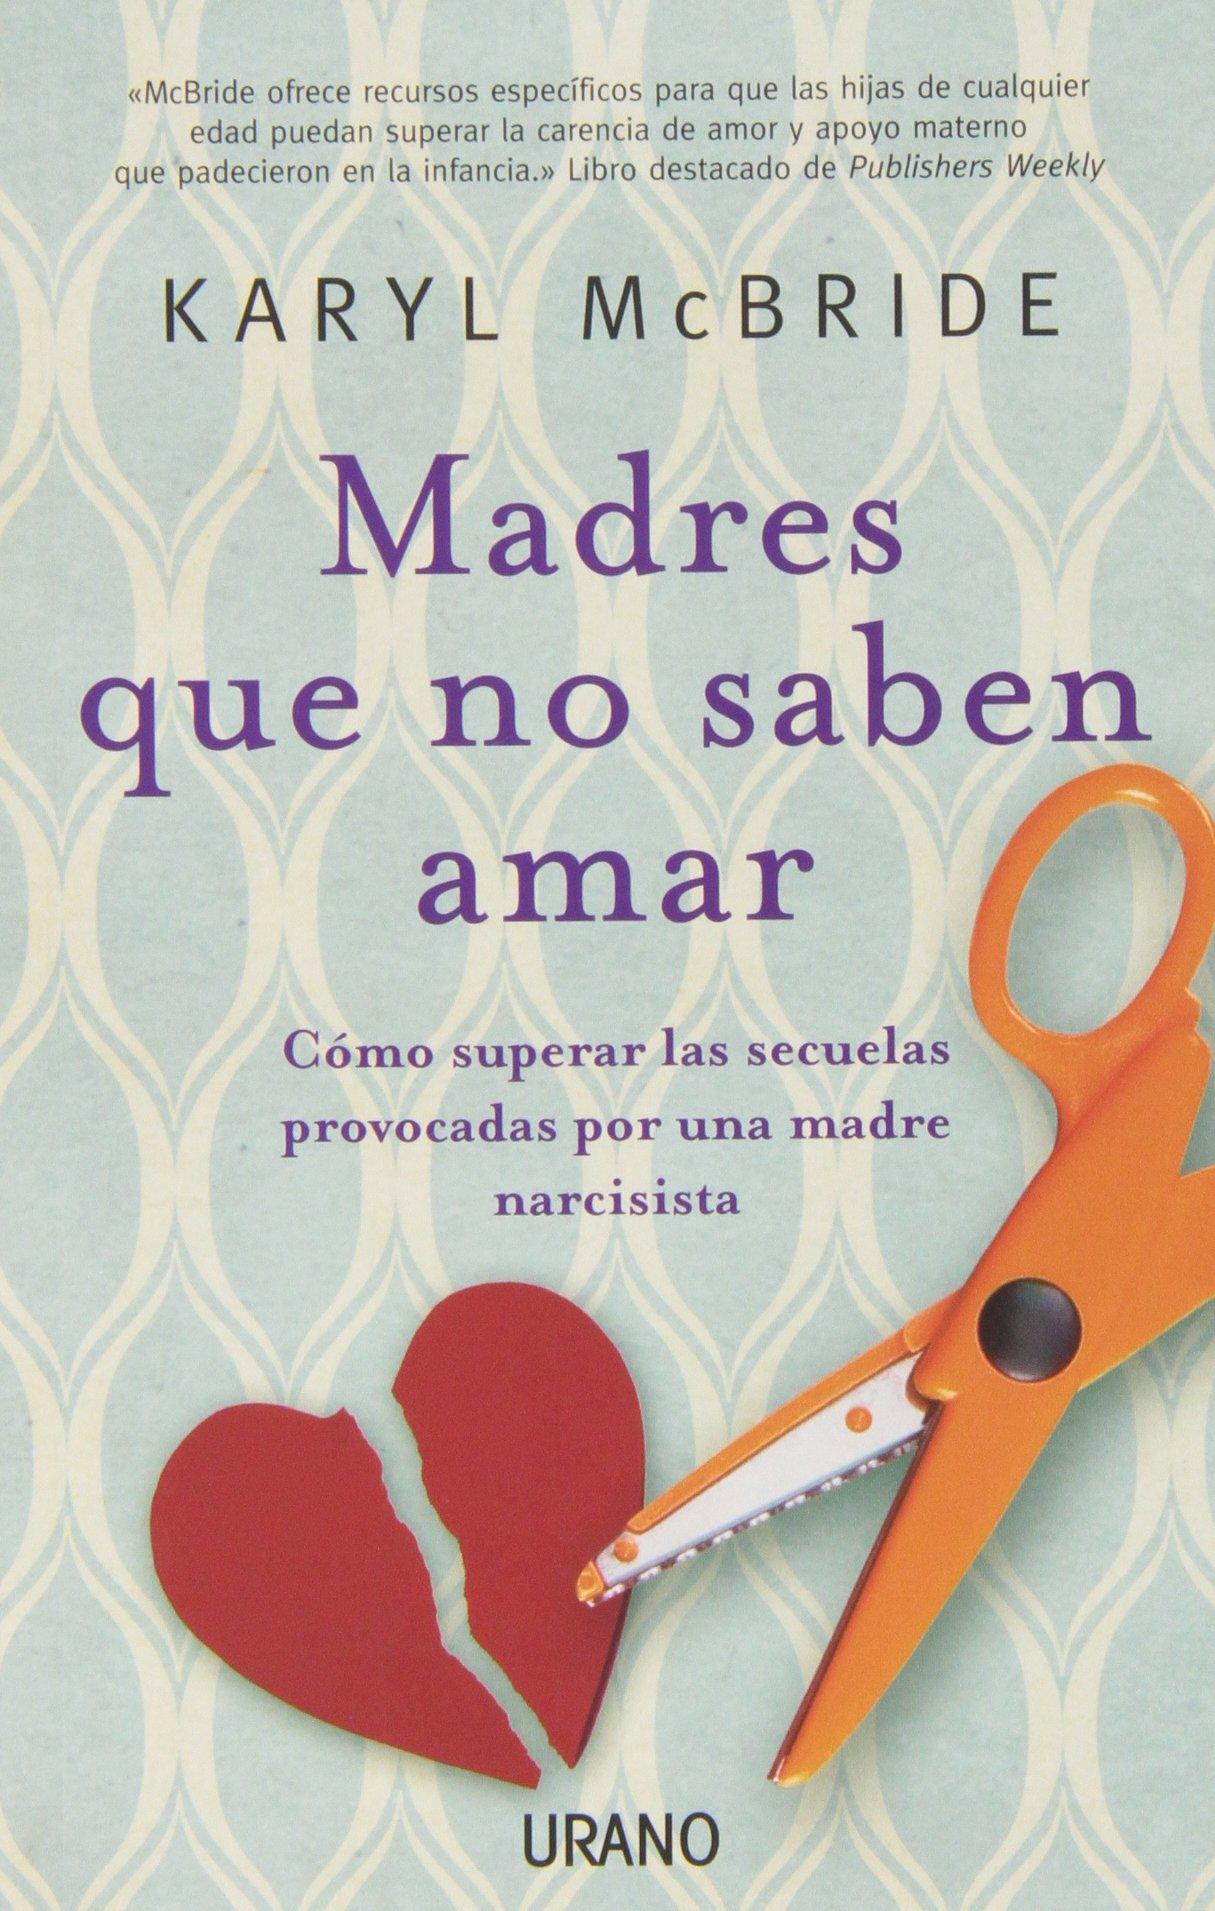 Madres que no saben amar (Spanish Edition): Karyl McBride ...